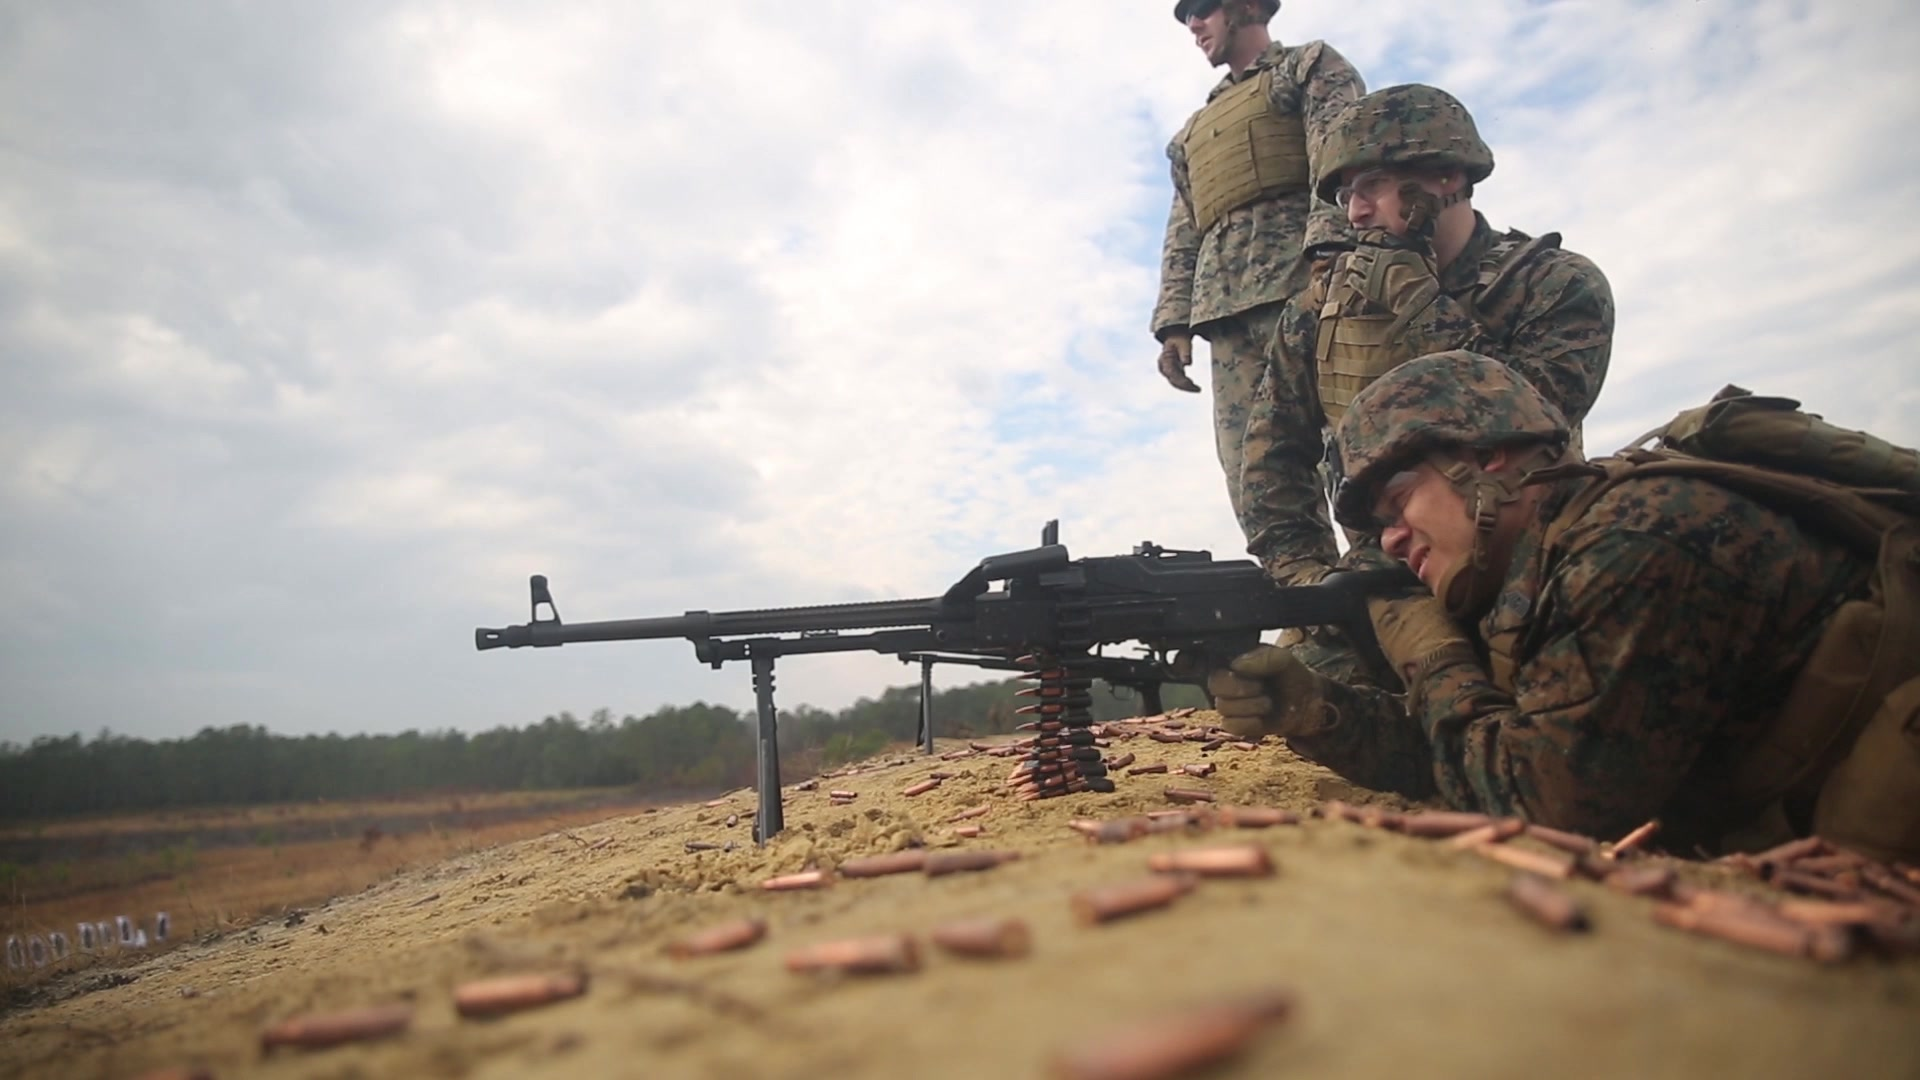 U.S. Marines • Fire Machine Guns & Grenade Launchers • Camp Pendleton, Calif • Sept 4, 2020